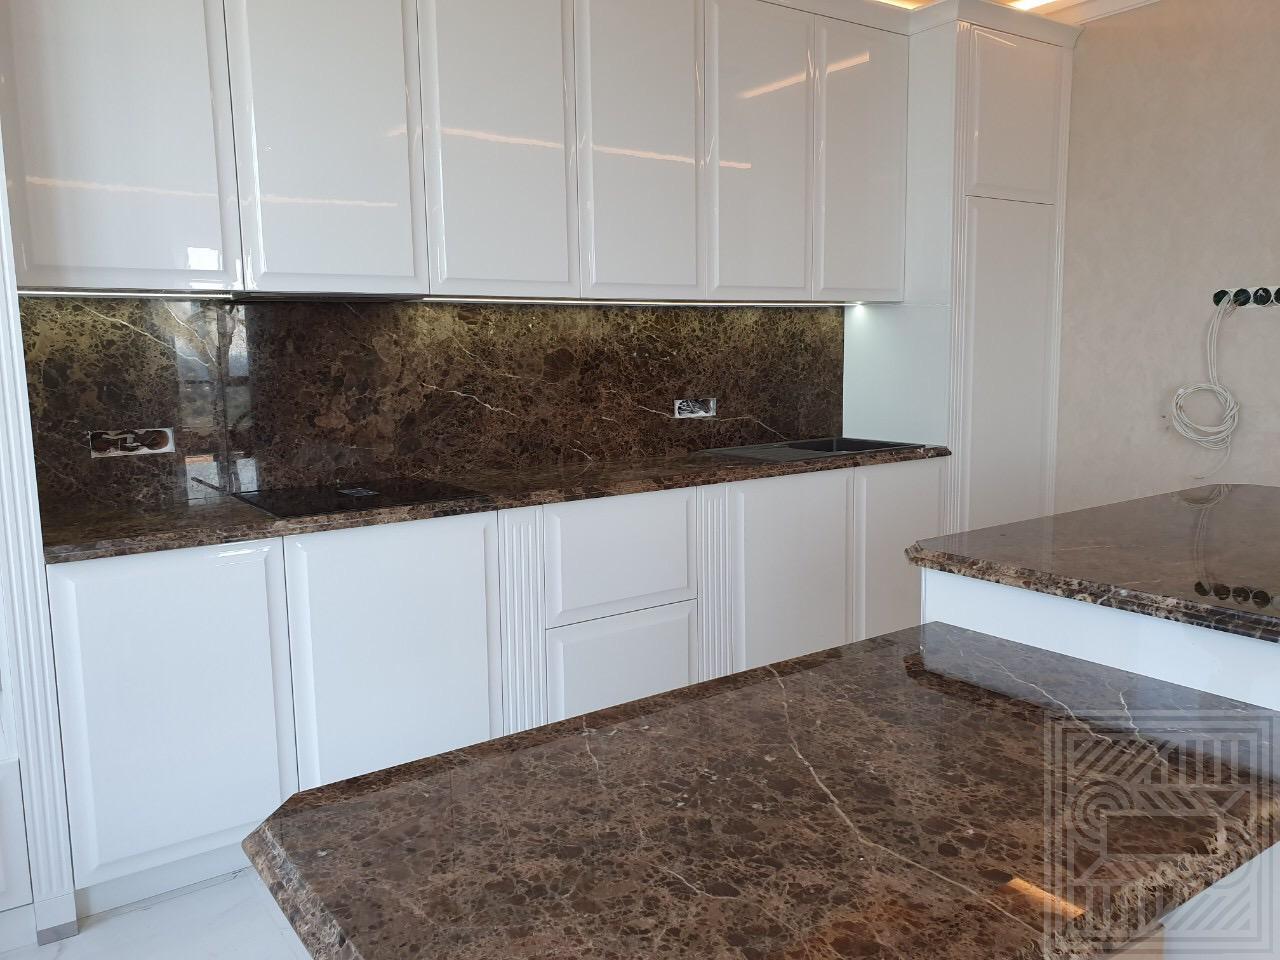 Кухонный комплекс из мрамора Emperador Brown 40 мм desk, worktop-marble, walls, furniture - 1